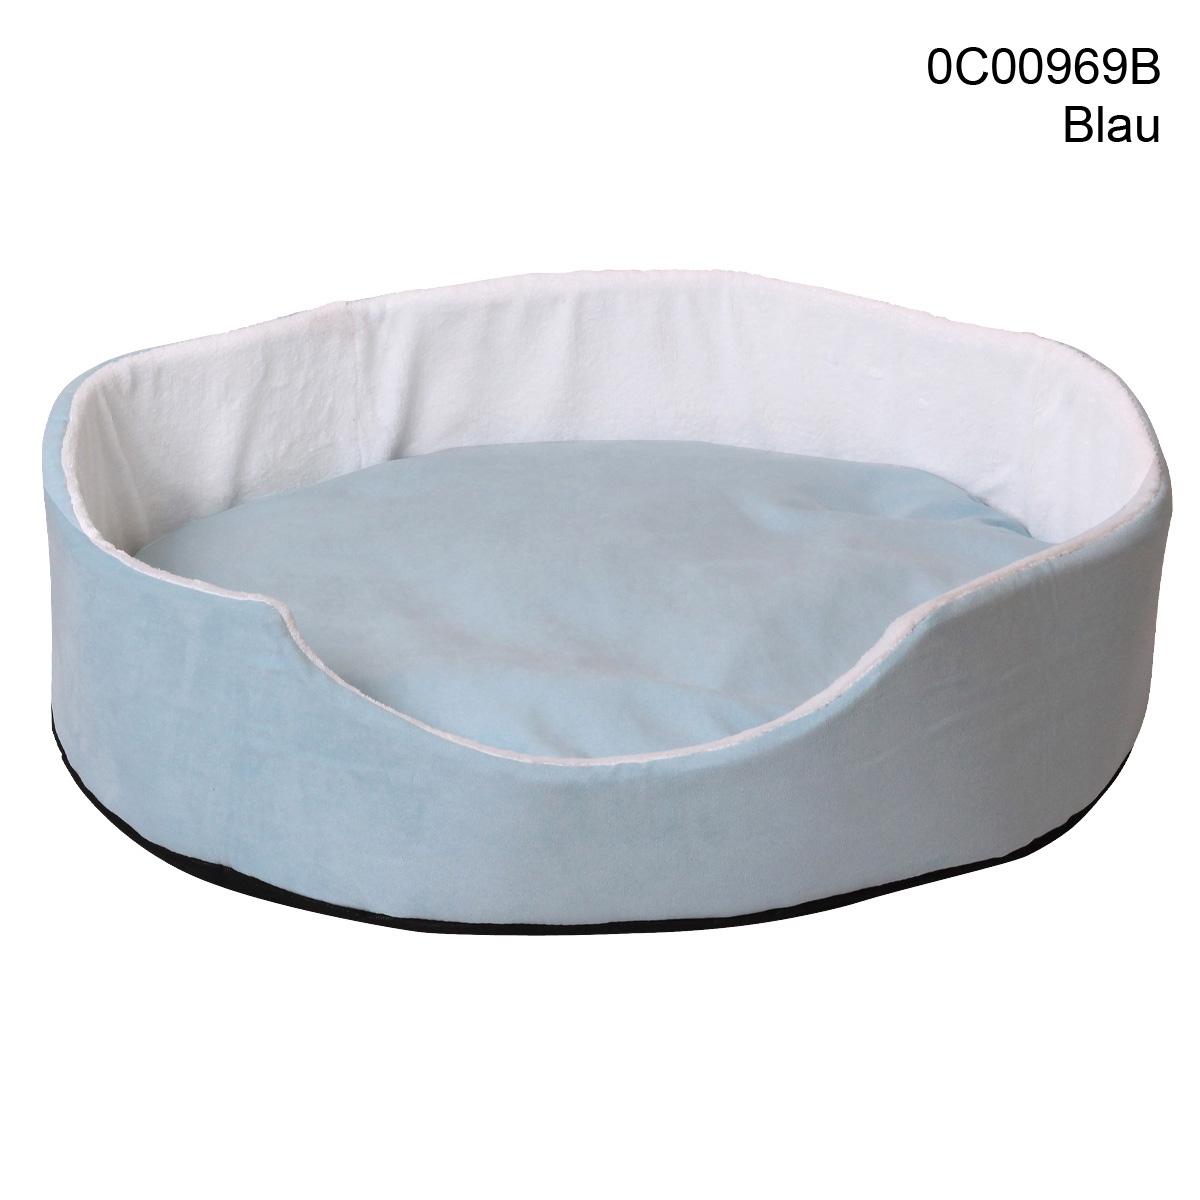 hundesofa schlafplatz hundebett kissen hund katze sofa bett ocoo969b blau. Black Bedroom Furniture Sets. Home Design Ideas